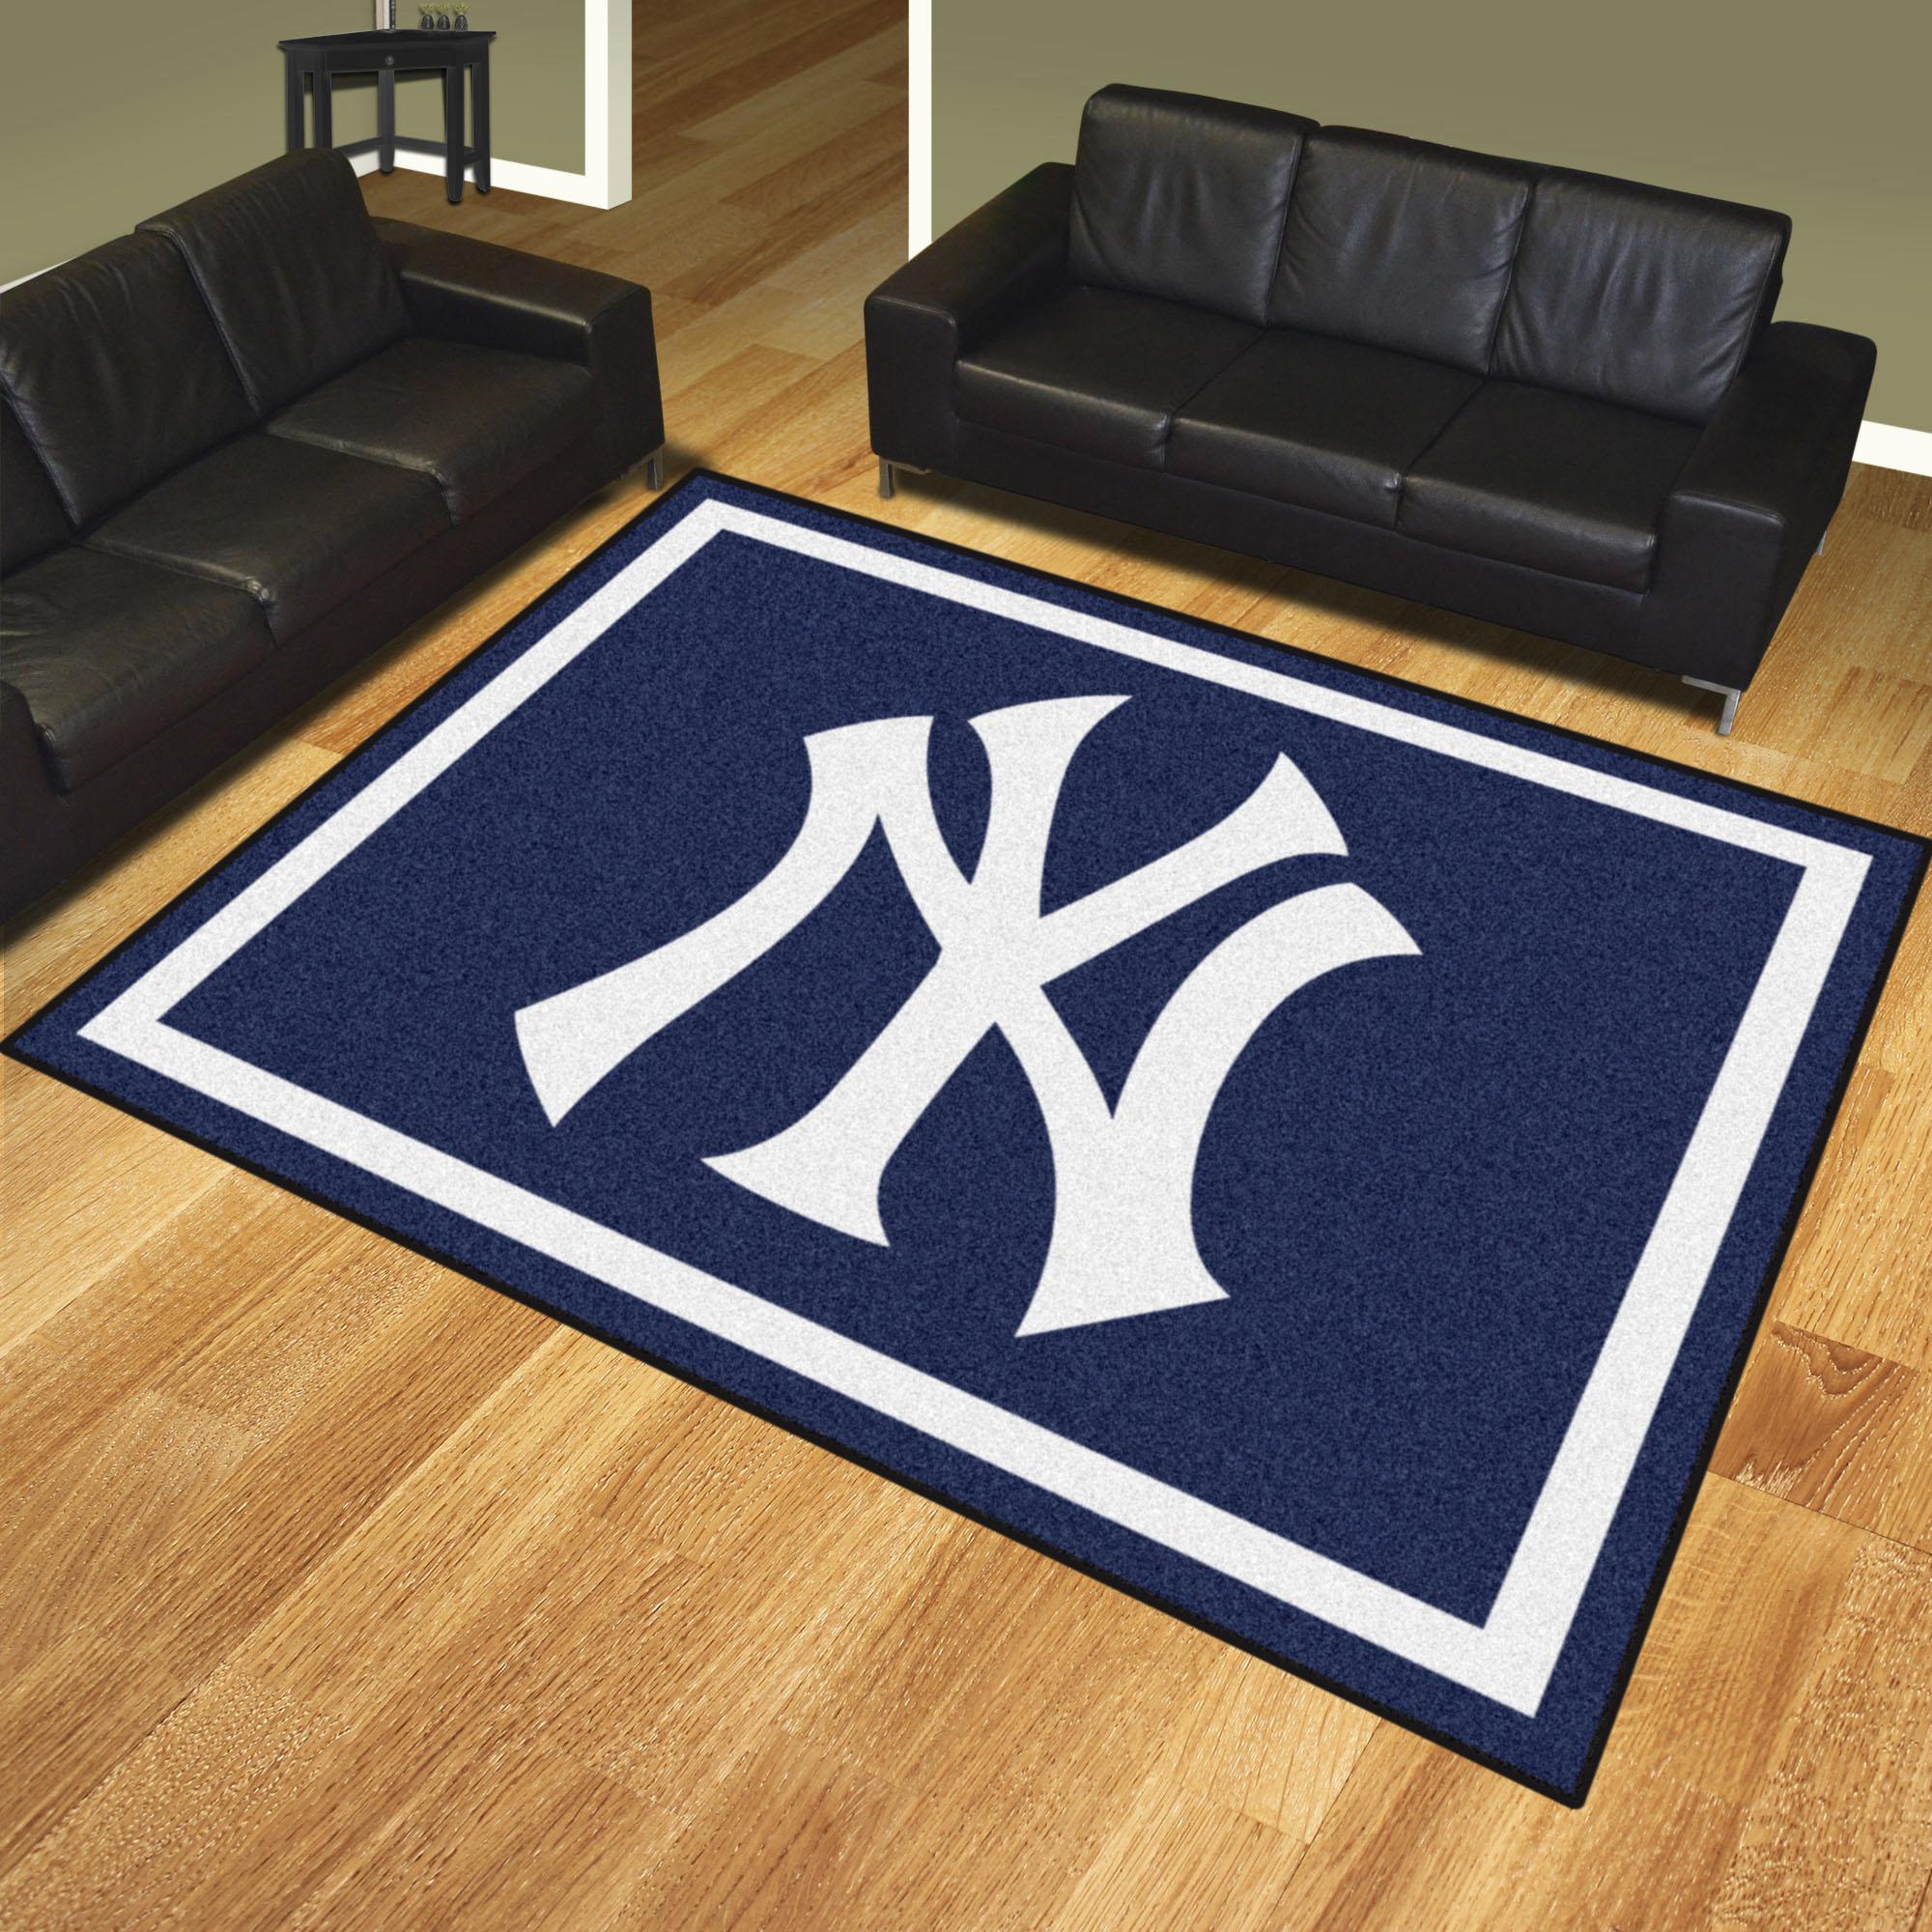 New York Yankees Ultra Plush 8x10 Area Rug